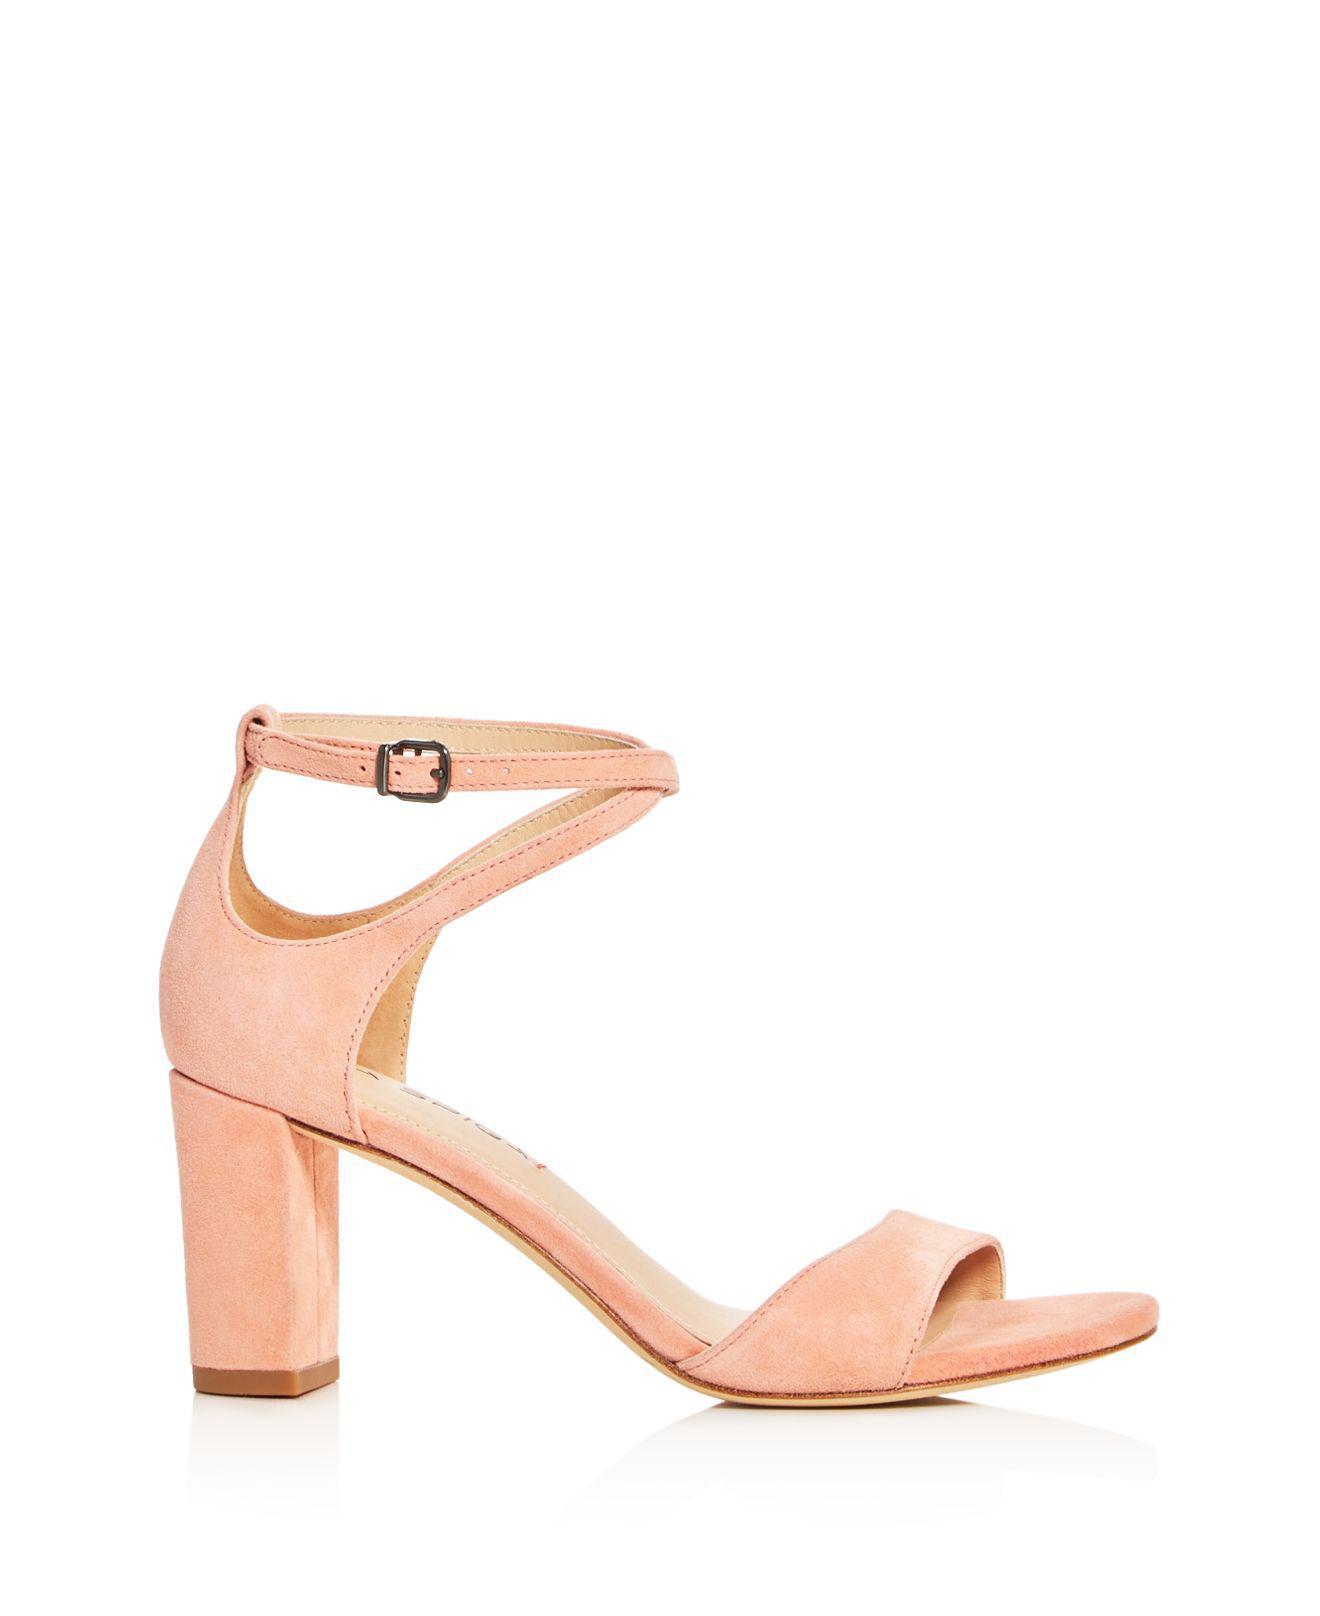 8b83250a318 Lyst - Via Spiga Wendi Crisscross Ankle Strap High Heel Sandals in Black